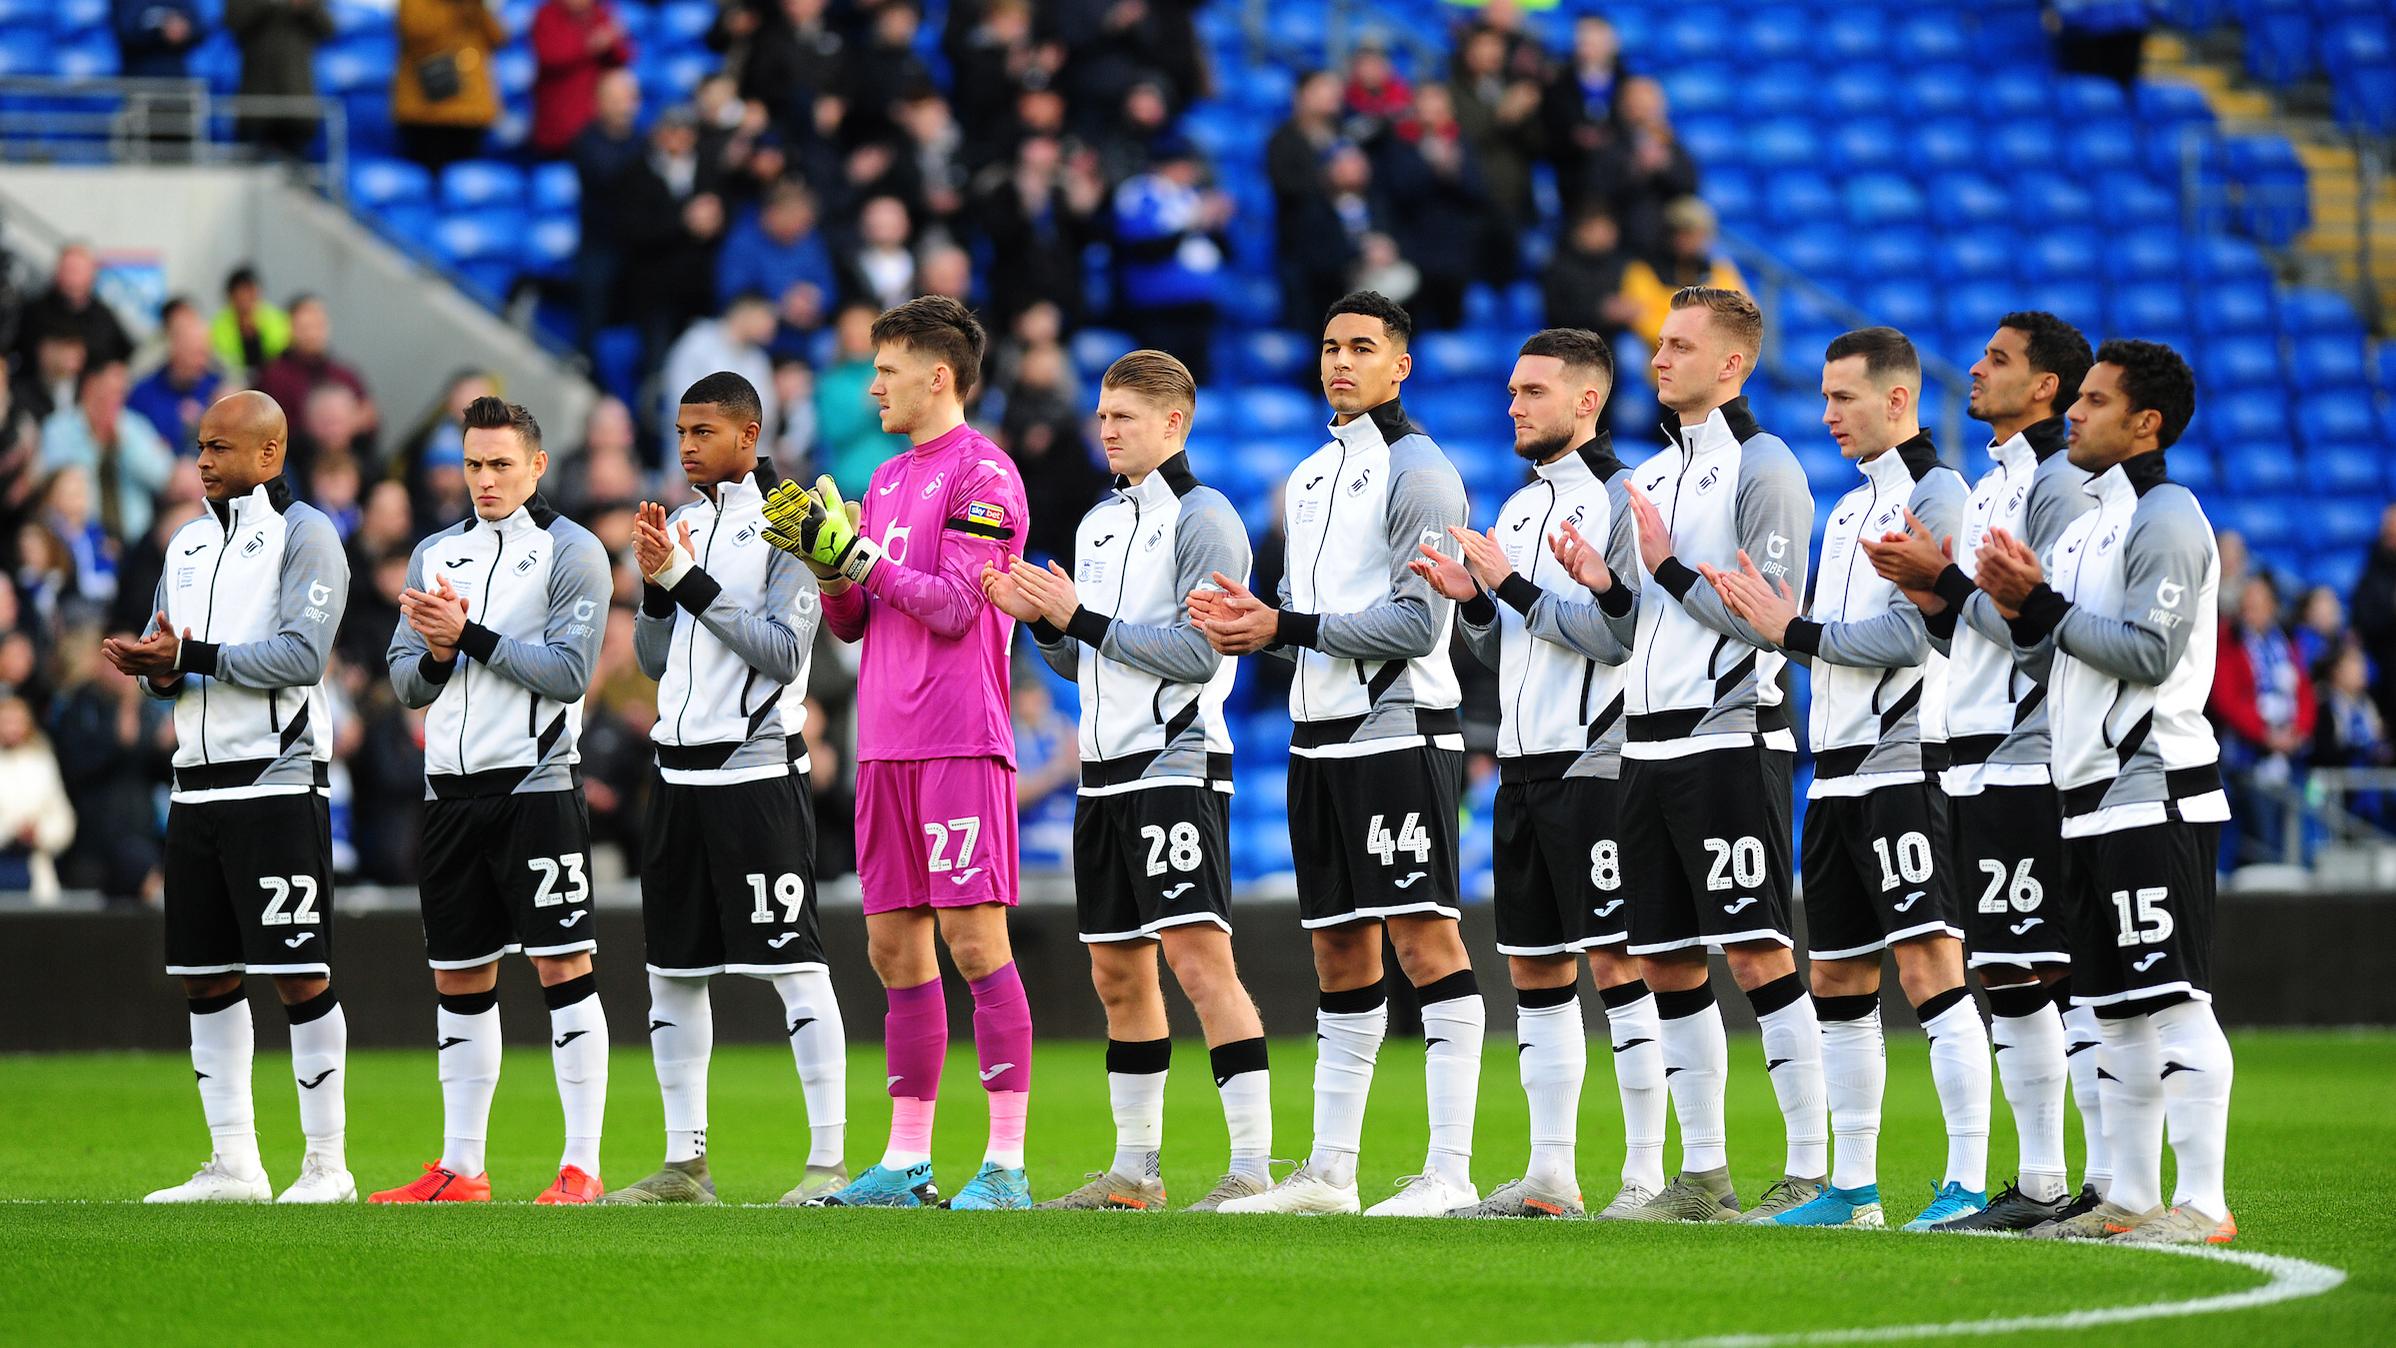 Cardiff team line-up